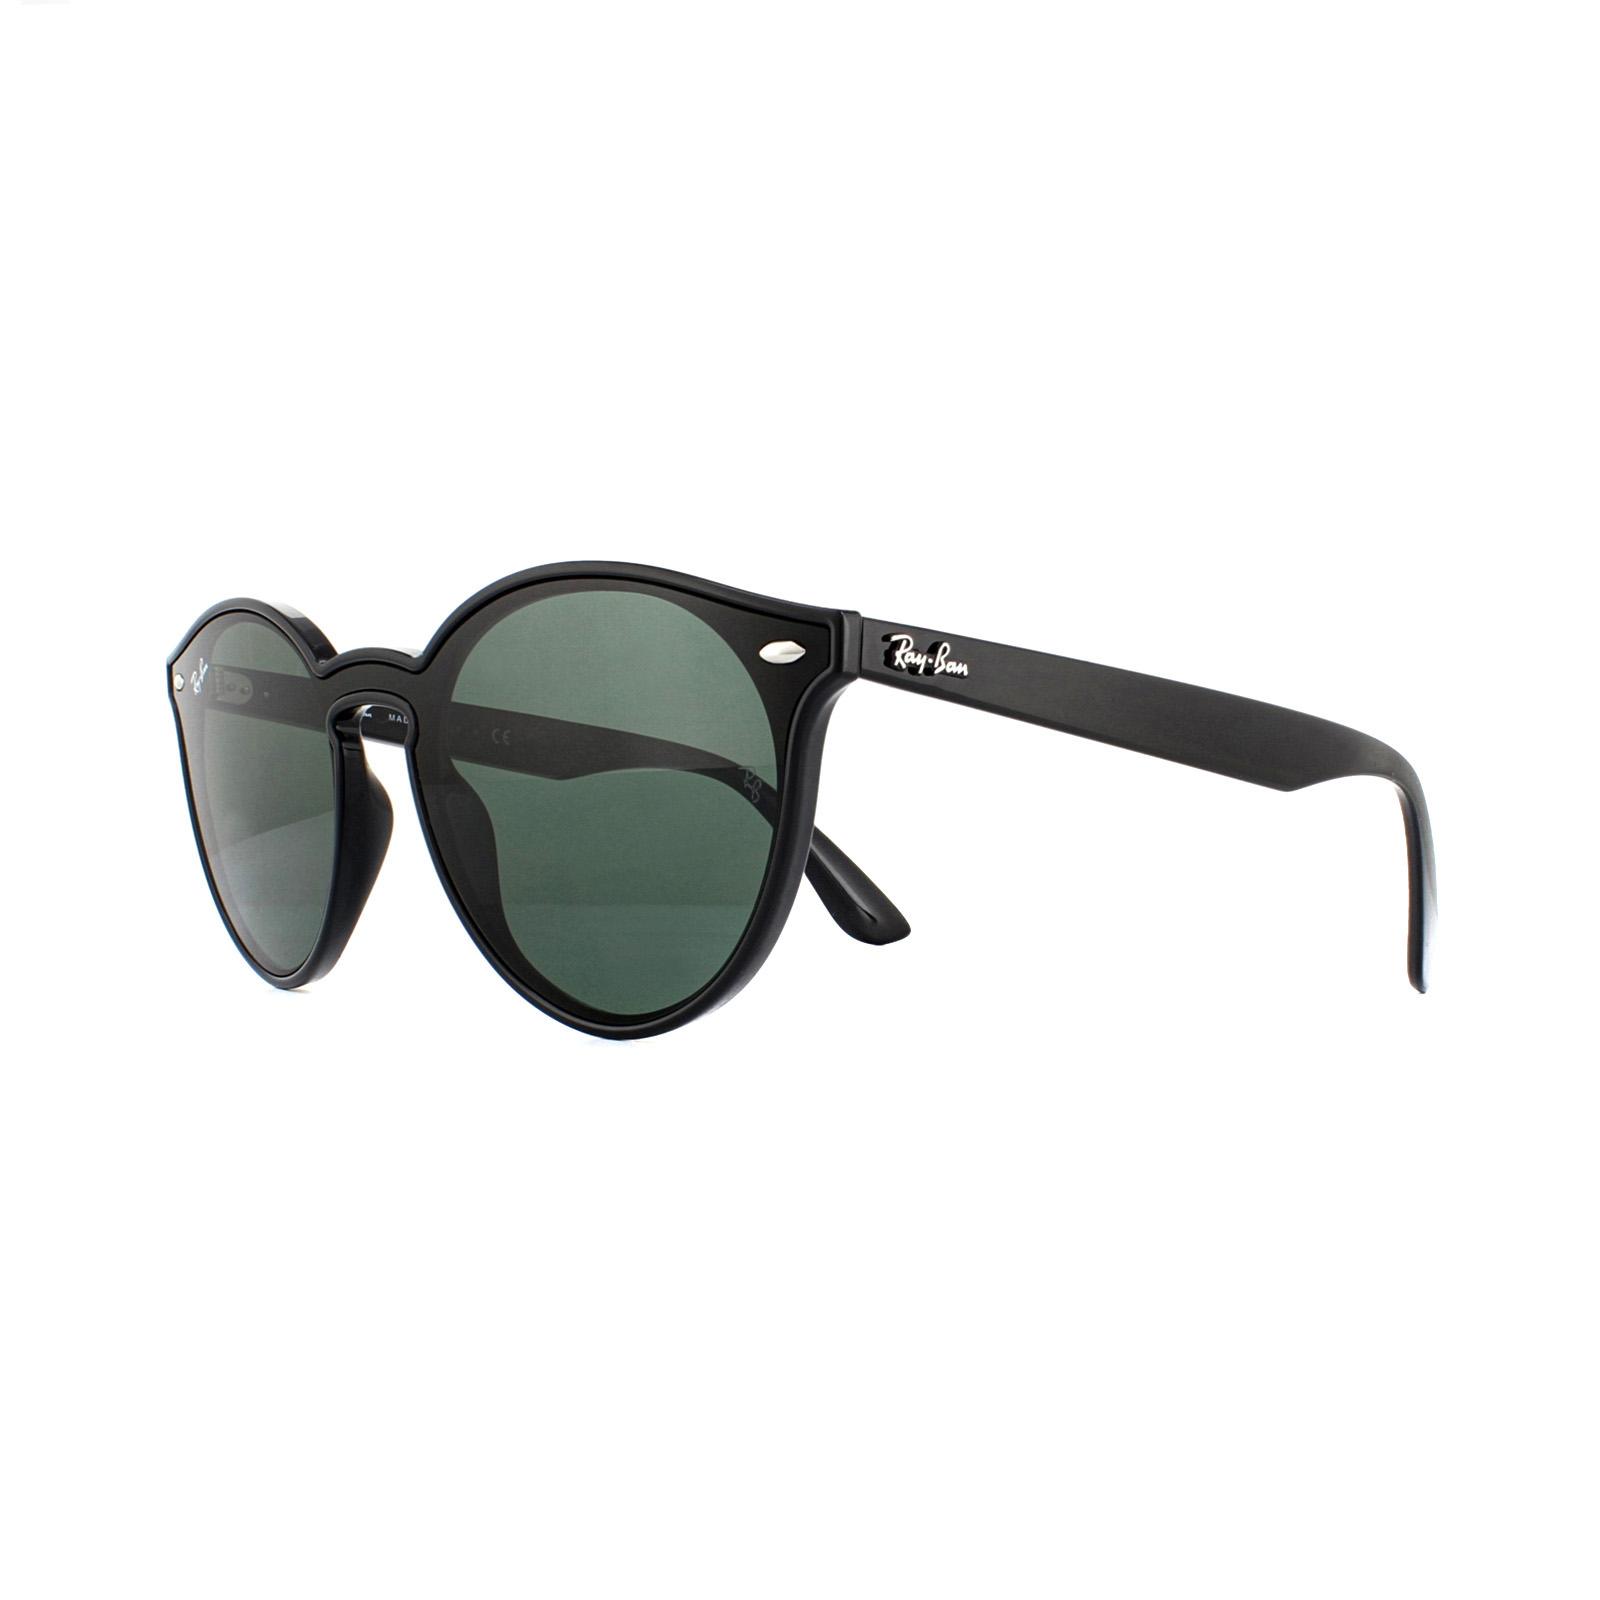 ac965e42fa Ray-Ban Sunglasses RB4380N 601 71 Black Green 8053672918991